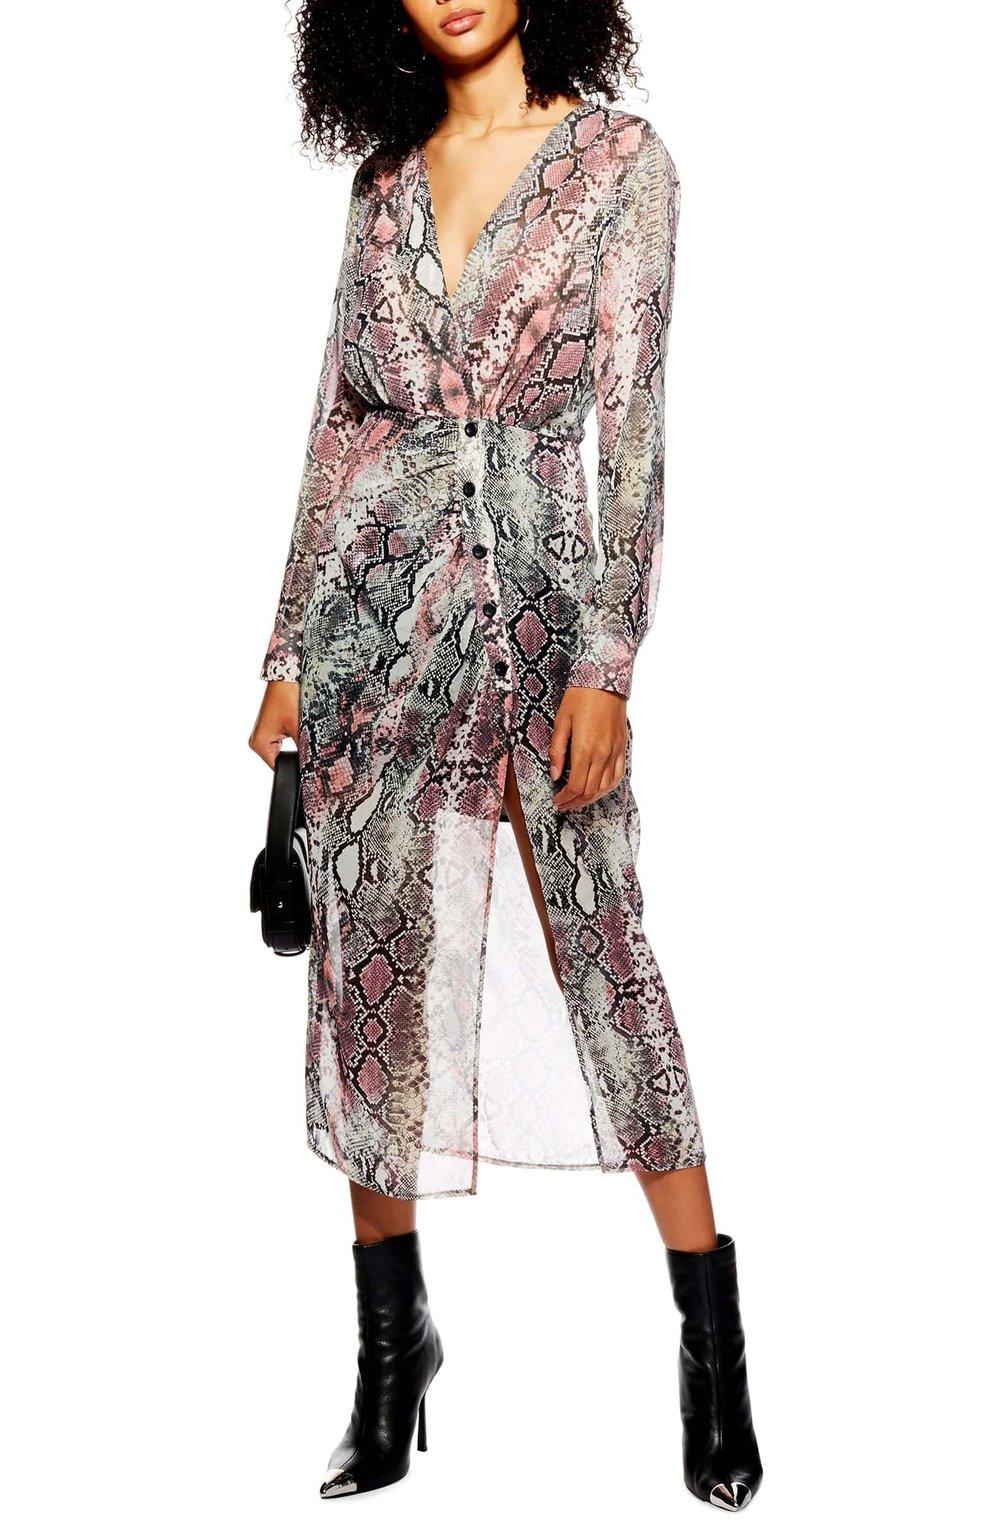 Topshop Snakeprint Dress